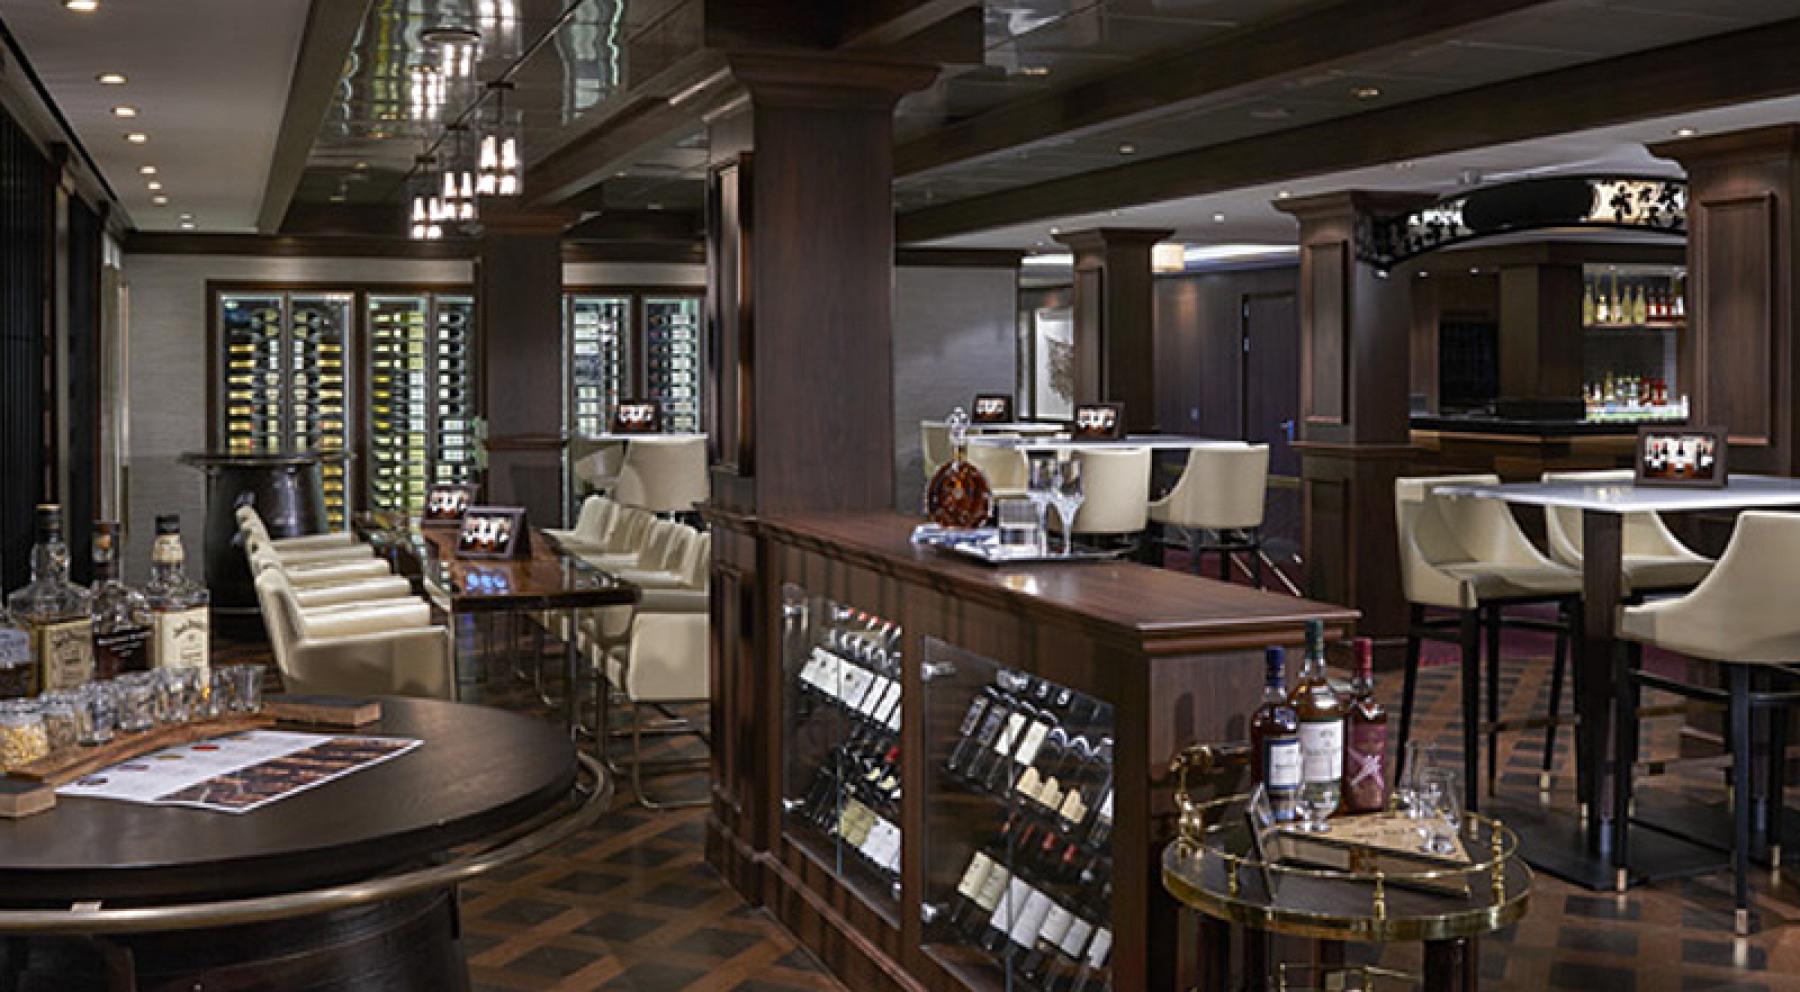 Norwegian Cruise Lines Norwegian Joy Interior Le Cave Wine Bar.jpg